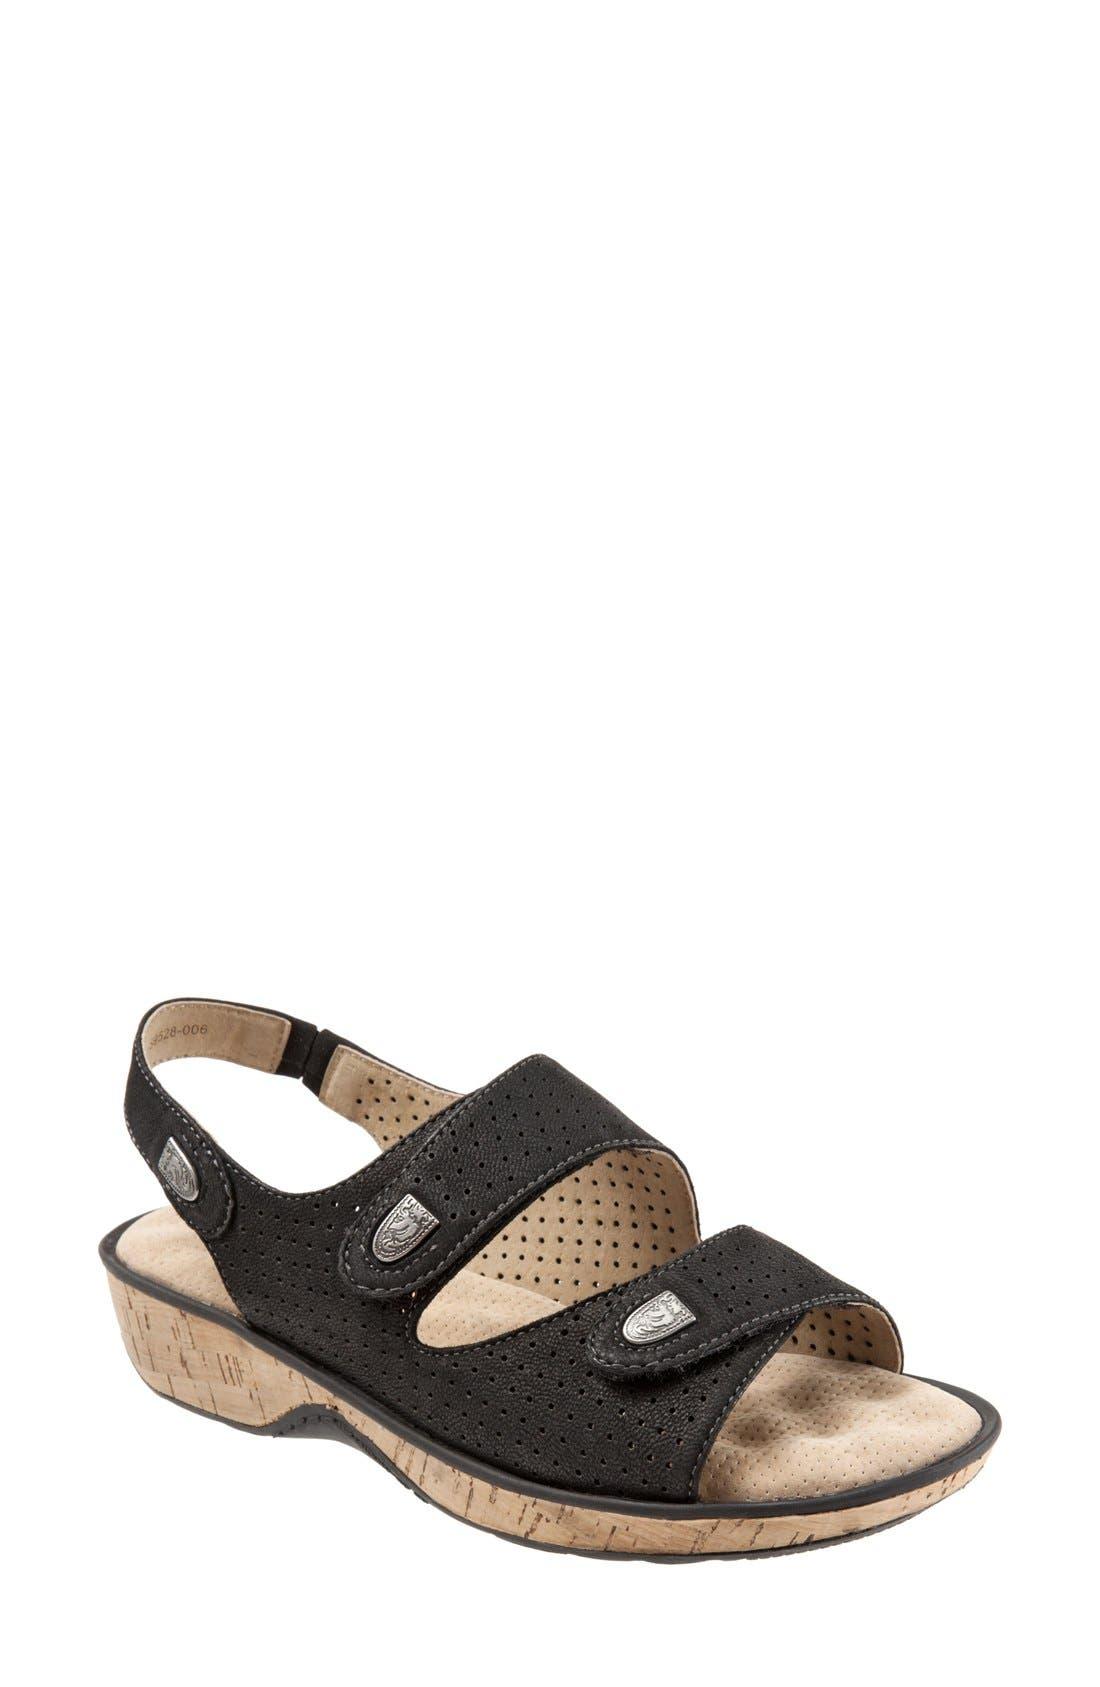 'Bolivia' Sandal,                             Main thumbnail 1, color,                             Black Perforated Leather